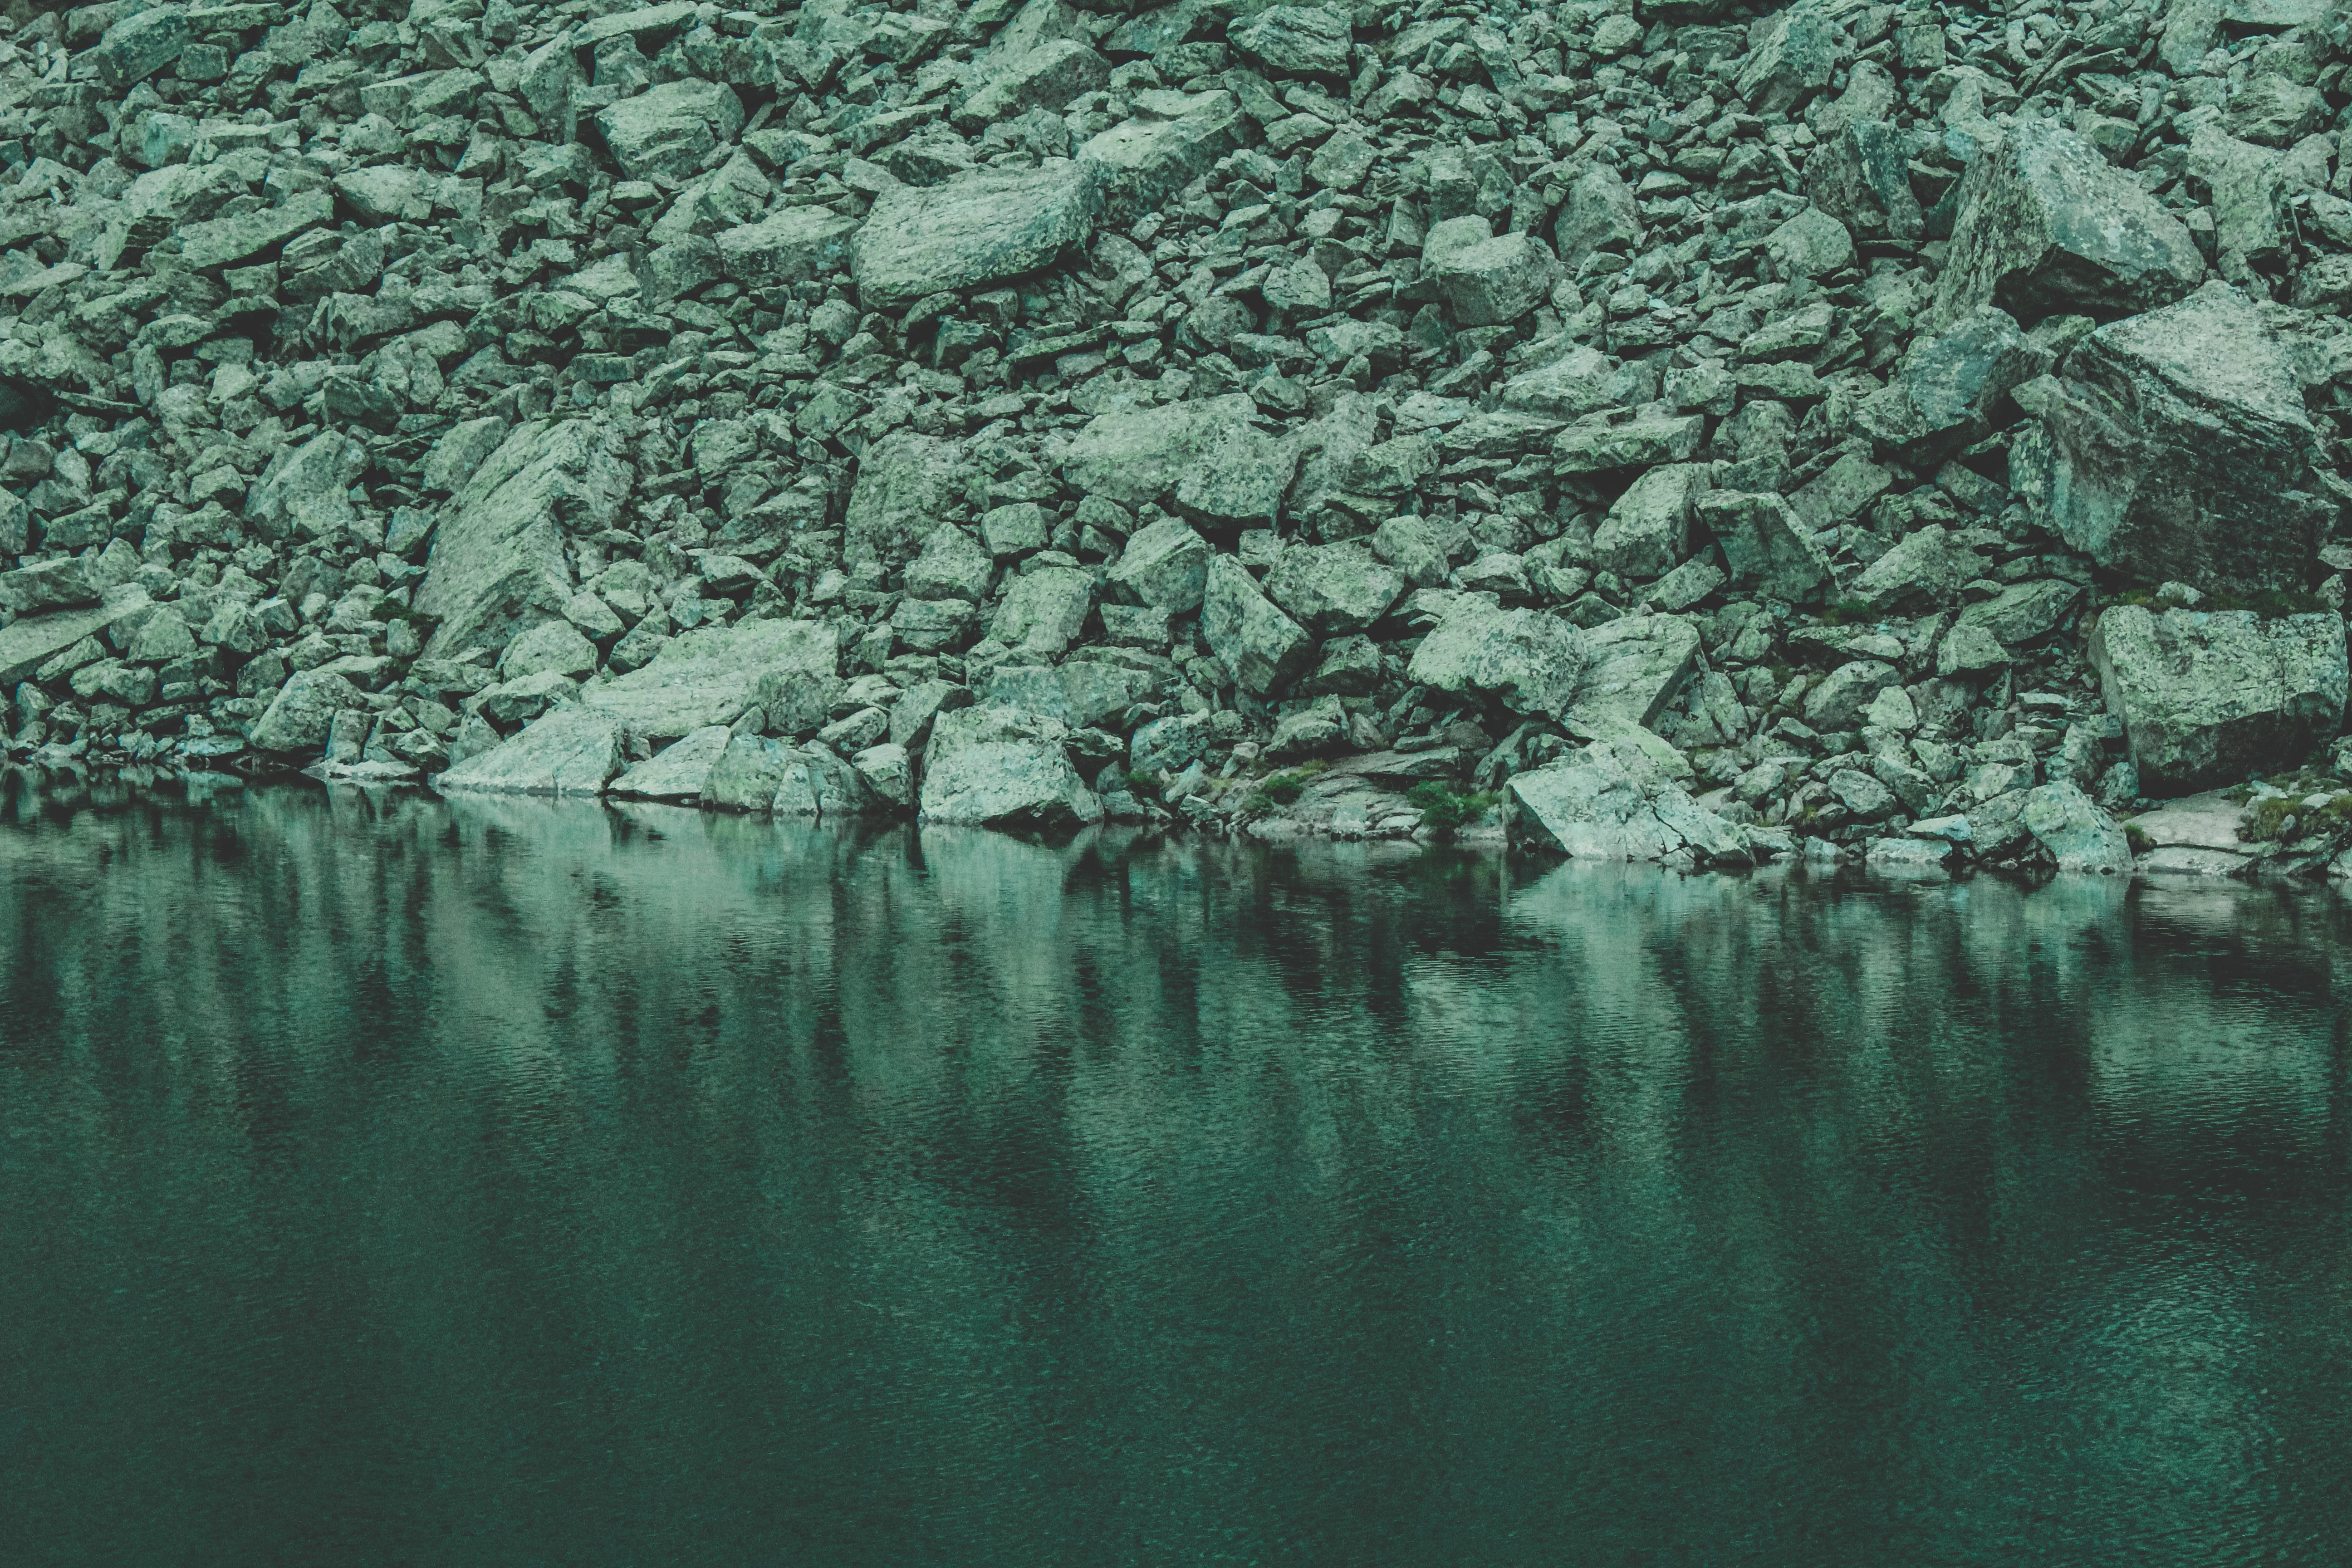 Rocks Near Calm Body Of Water